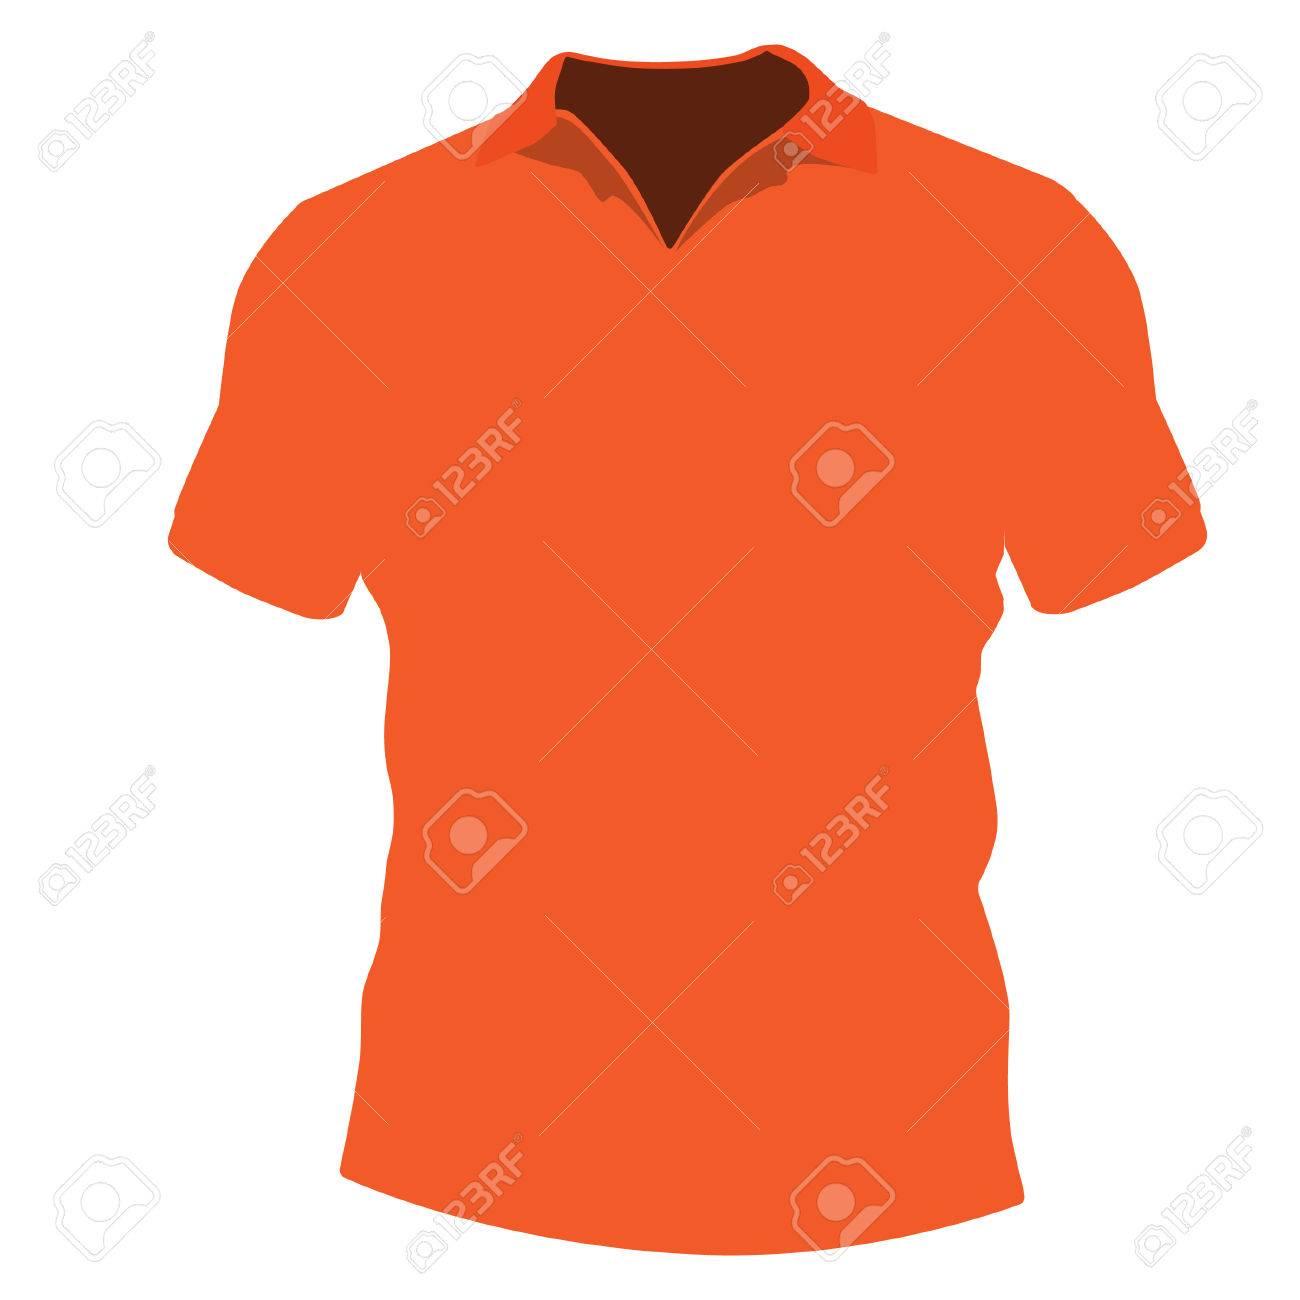 Shirt design illustrator template - Orange T Shirt Template Vector Illustration T Shirt Design T Shirt